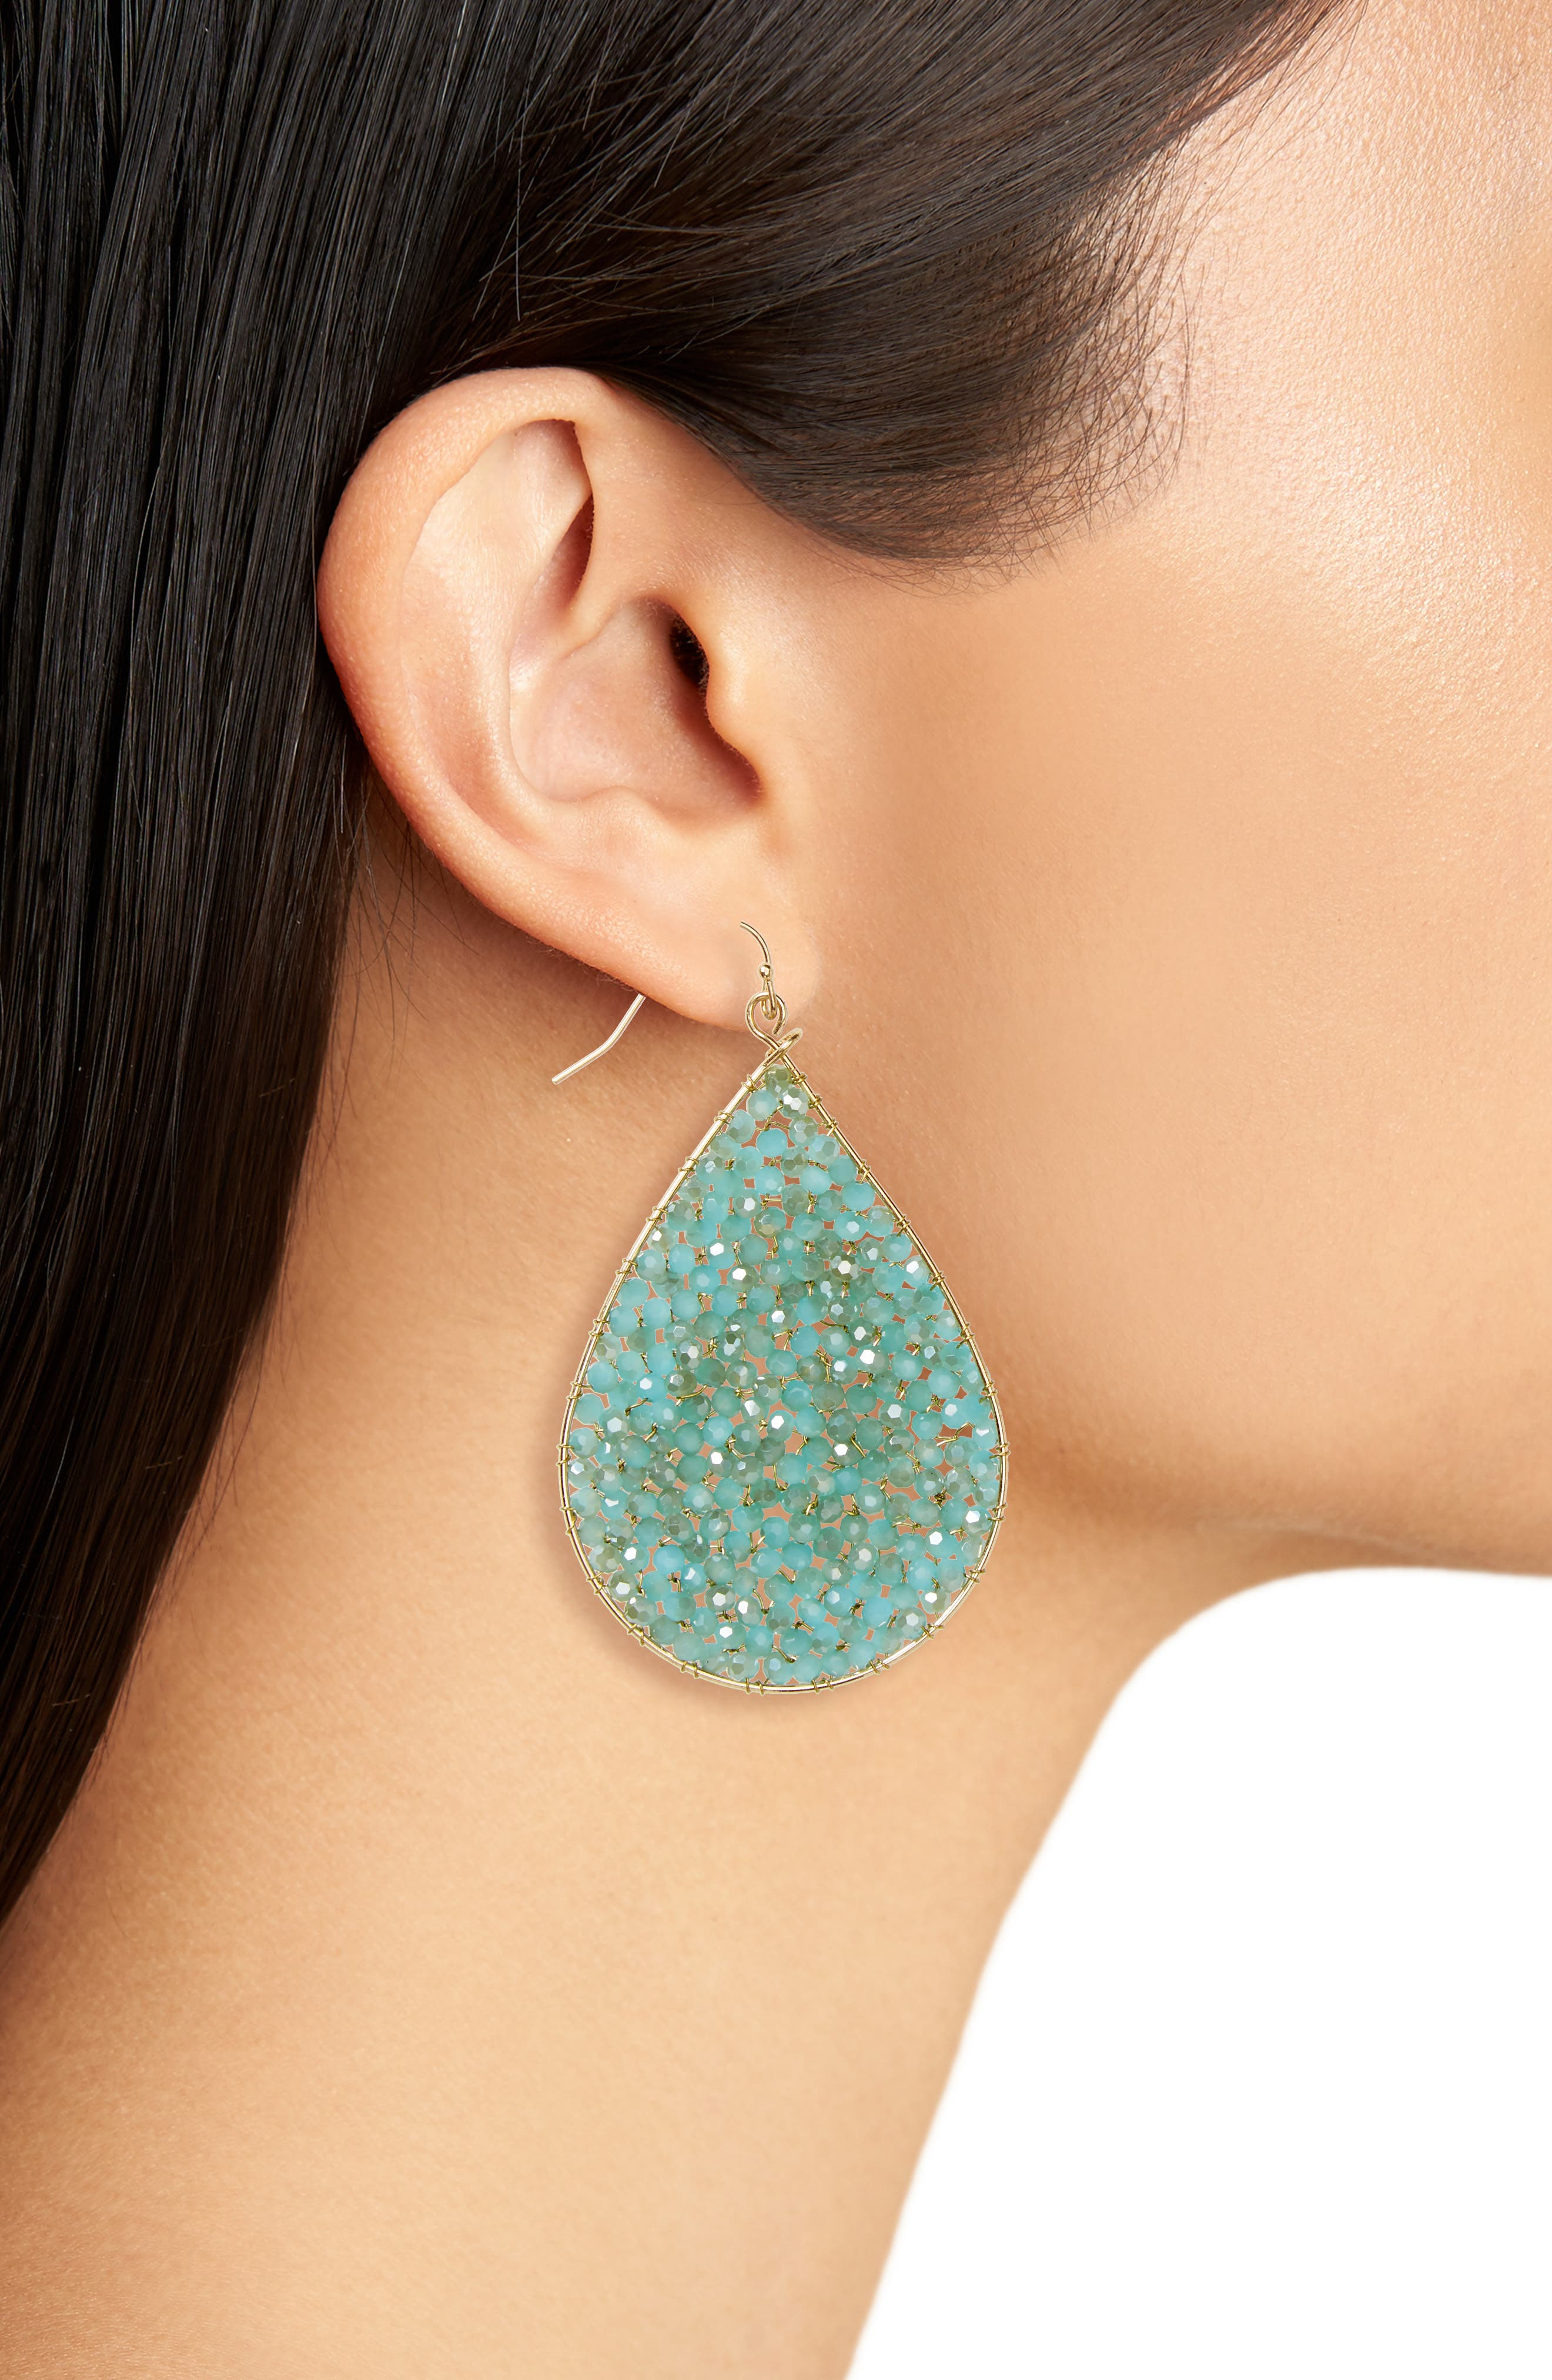 Crystal Teardrop Earrings,                             Alternate thumbnail 2, color,                             310